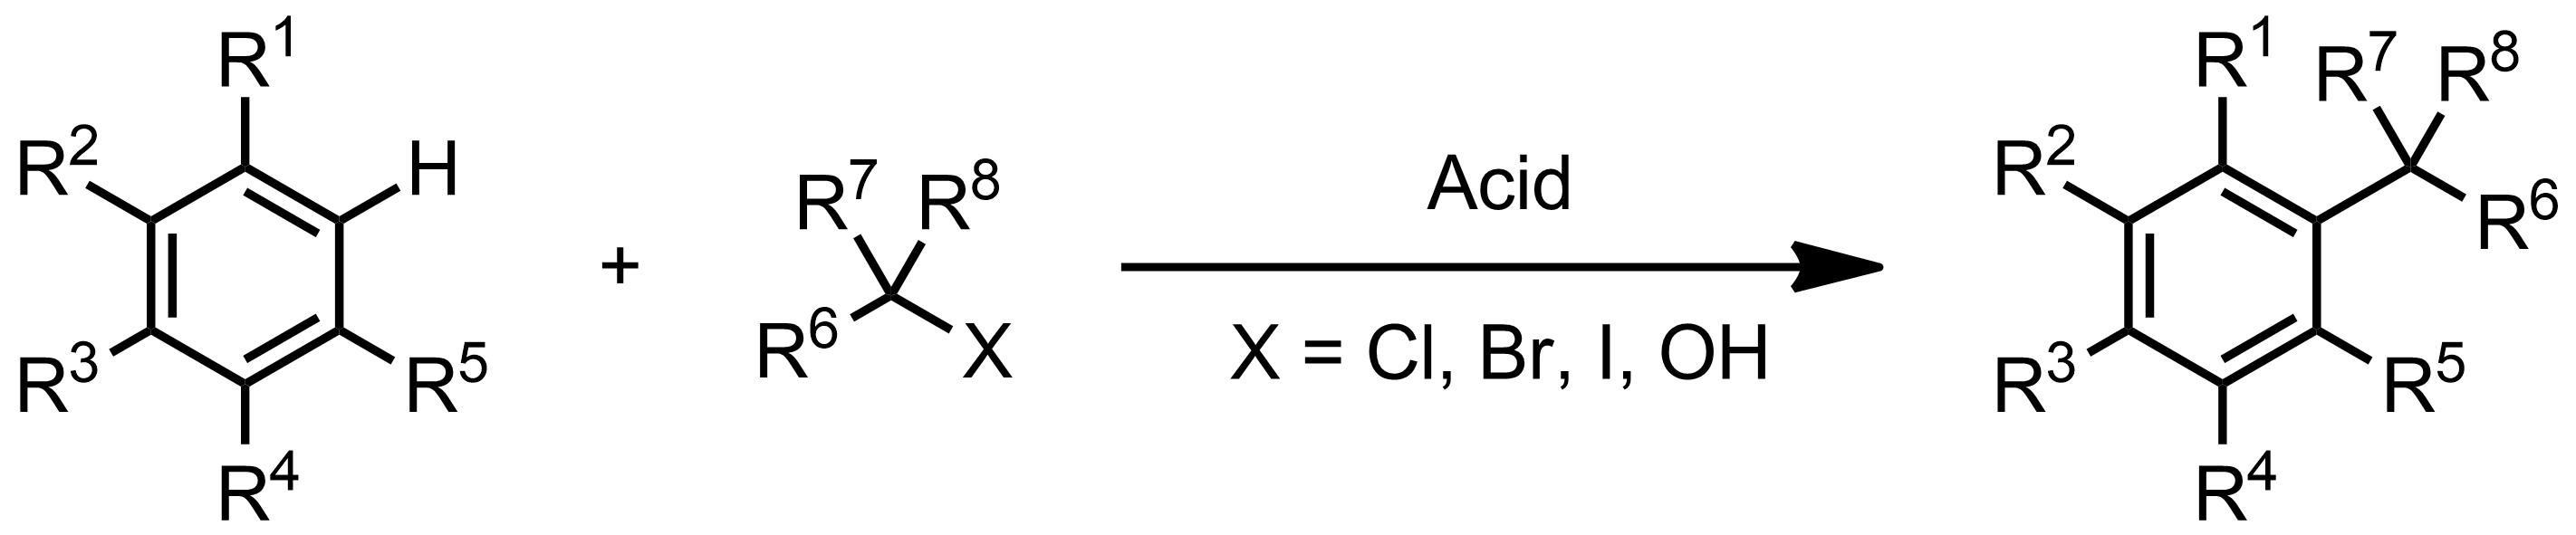 Schematic representation of the Friedel-Crafts Alkylation.